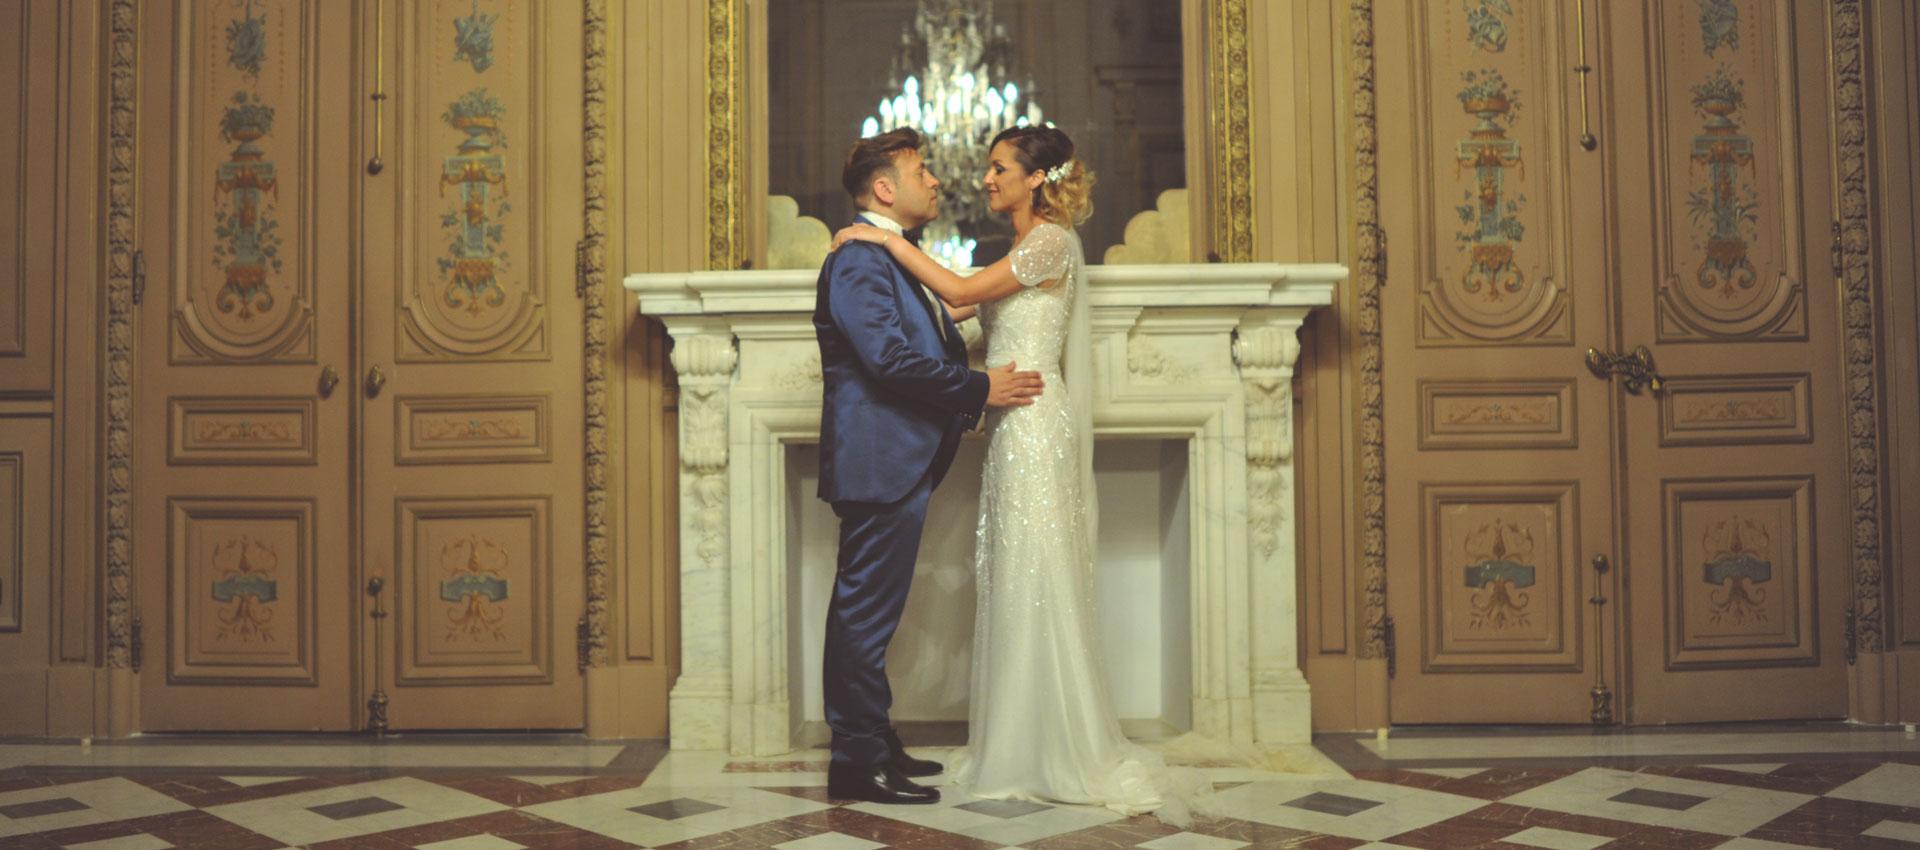 IMAGEN-DESTACAD Back to the Wedding - video boda cadiz